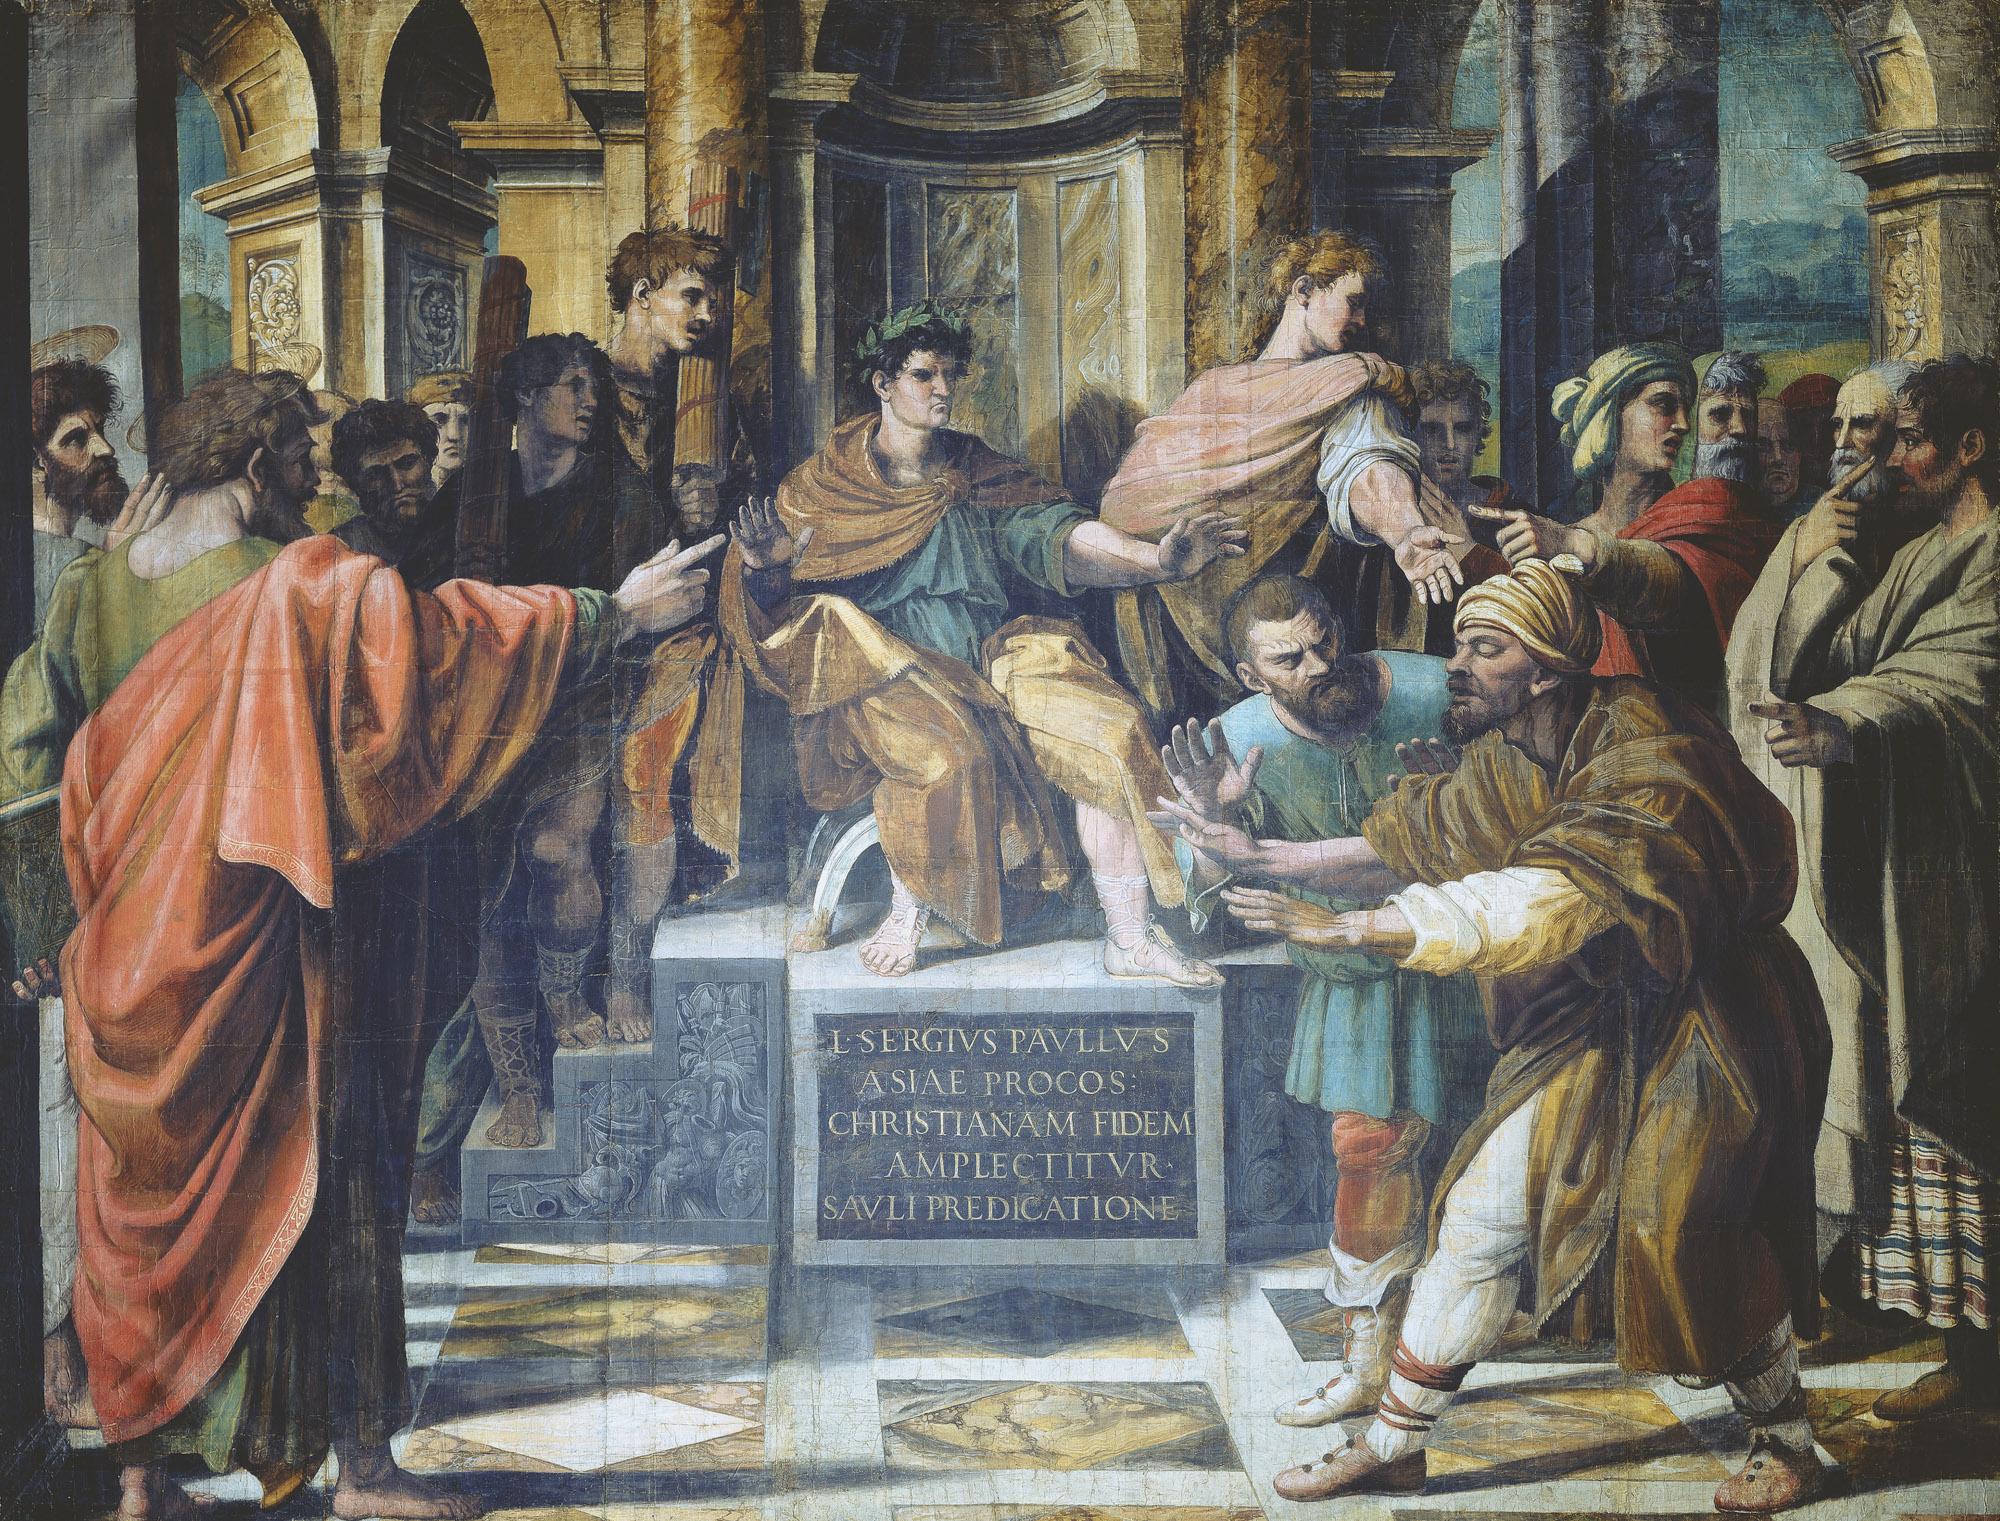 Raphael-Urbino---Painting---The Conversion of the Proconsul.jpg